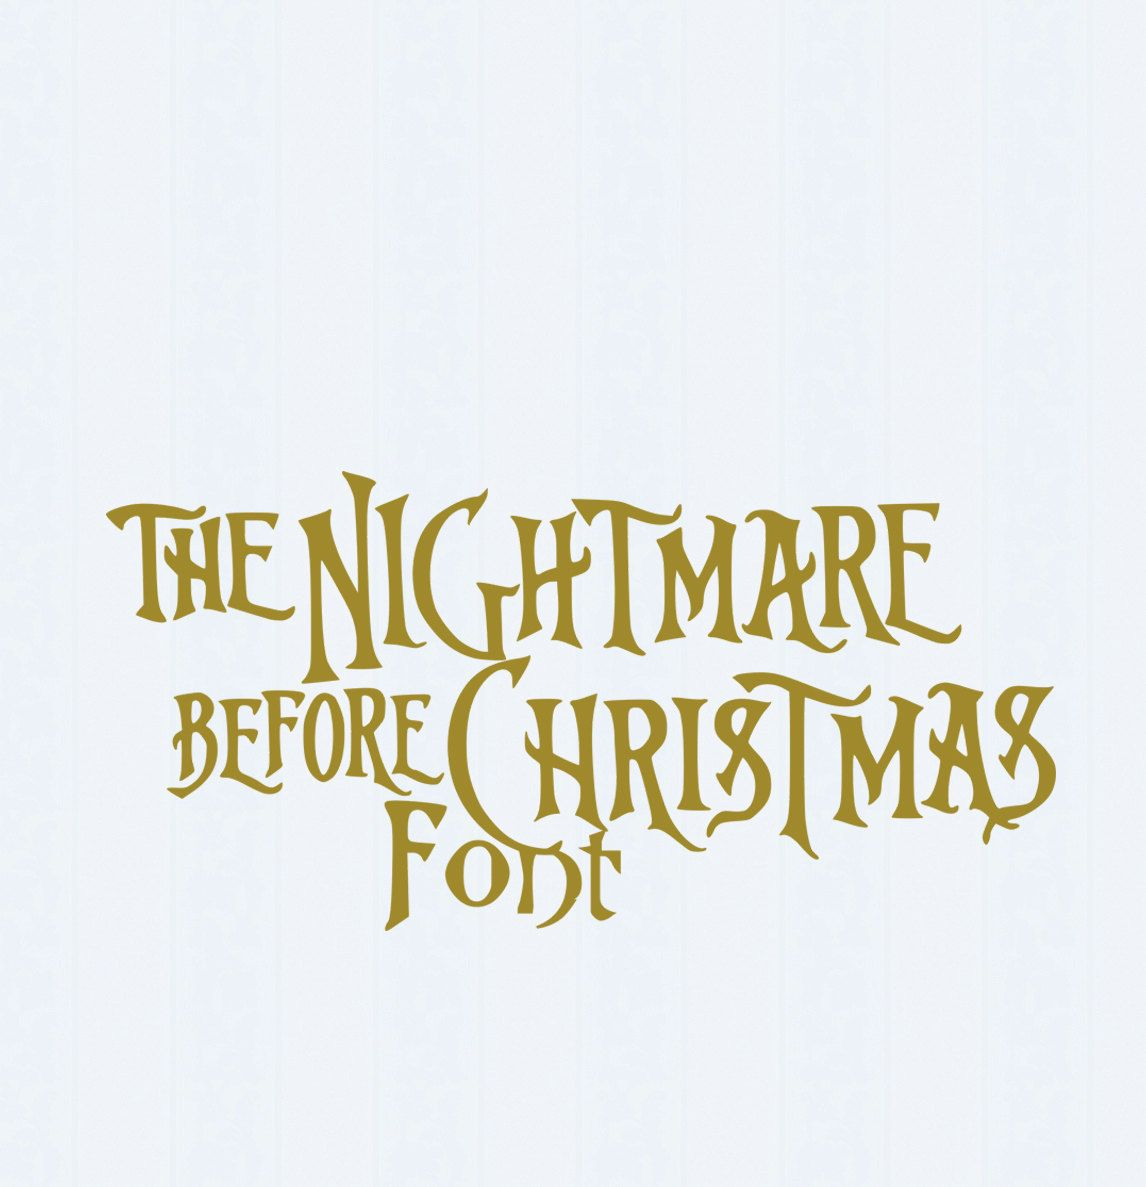 Nightmare before Christmas SVG Font, Digital Alphabet, SVG Letters ...